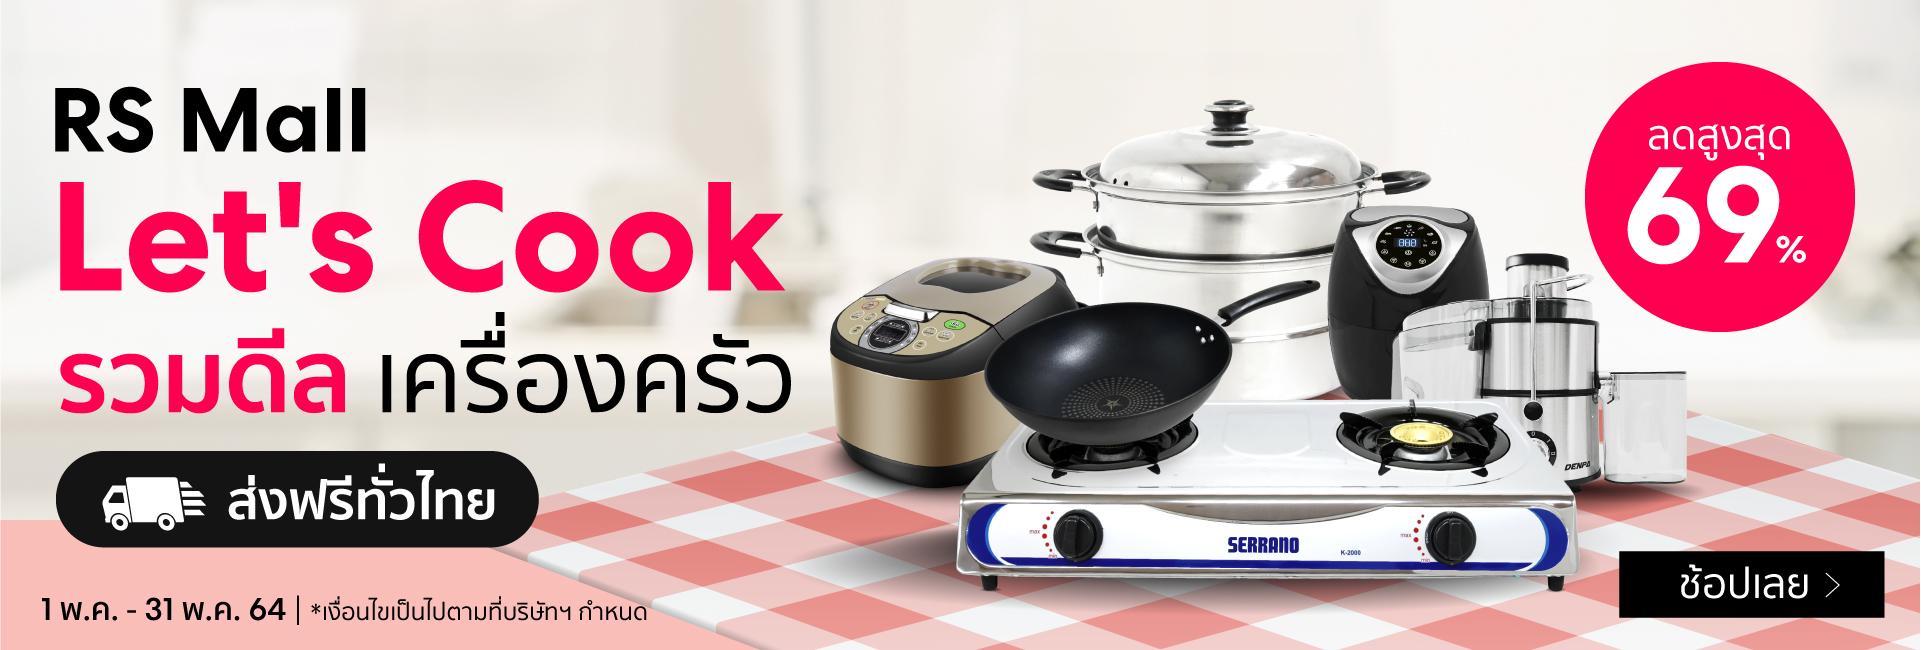 Let's Cook : รวมดีล เครื่องครัว